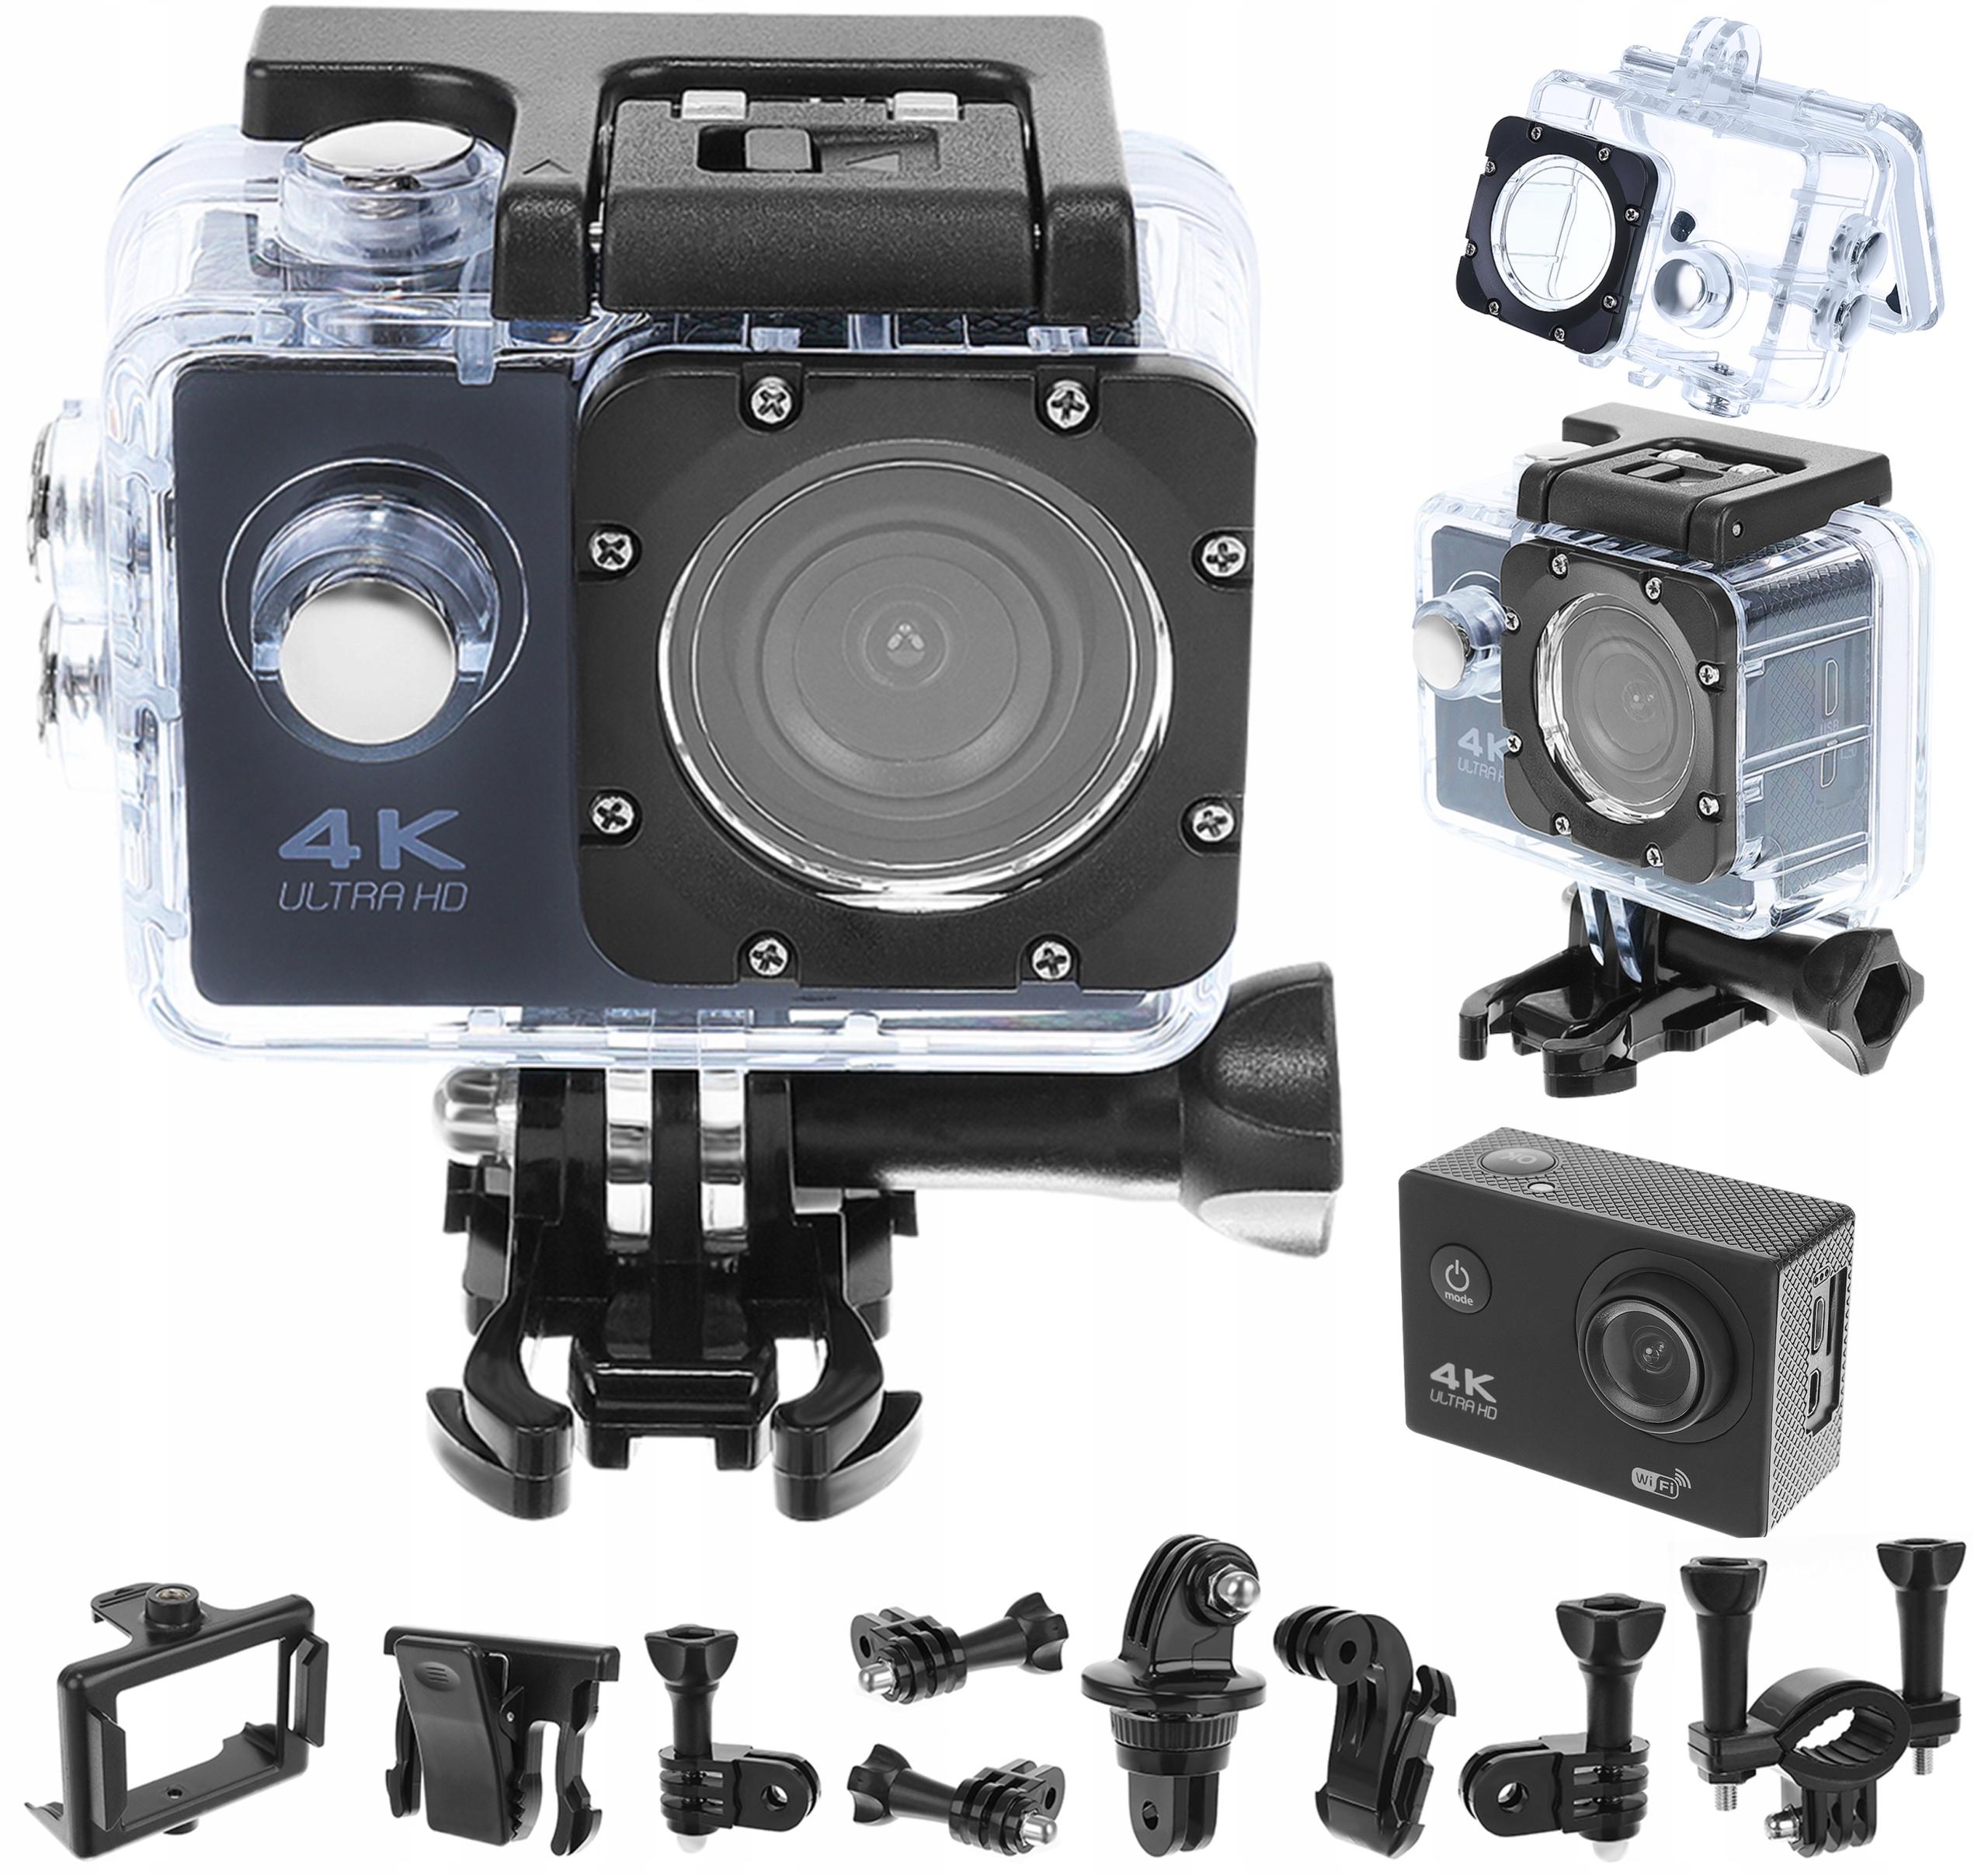 Спортивная камера 4K. Водонепроницаемая камера Wi-Fi SD64GB